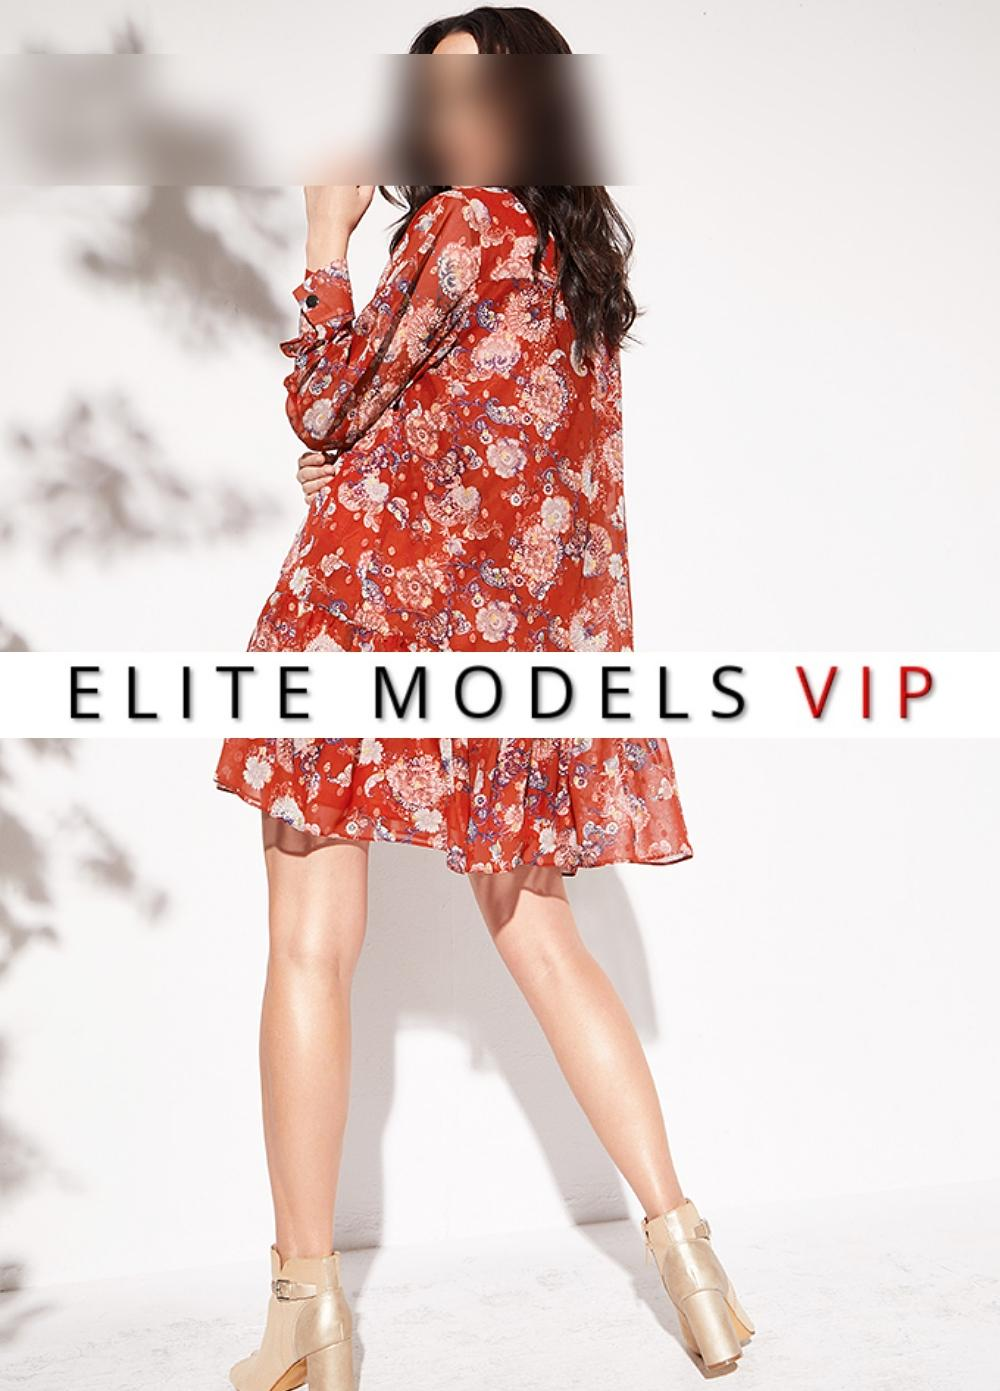 Midori from Elite Models VIP